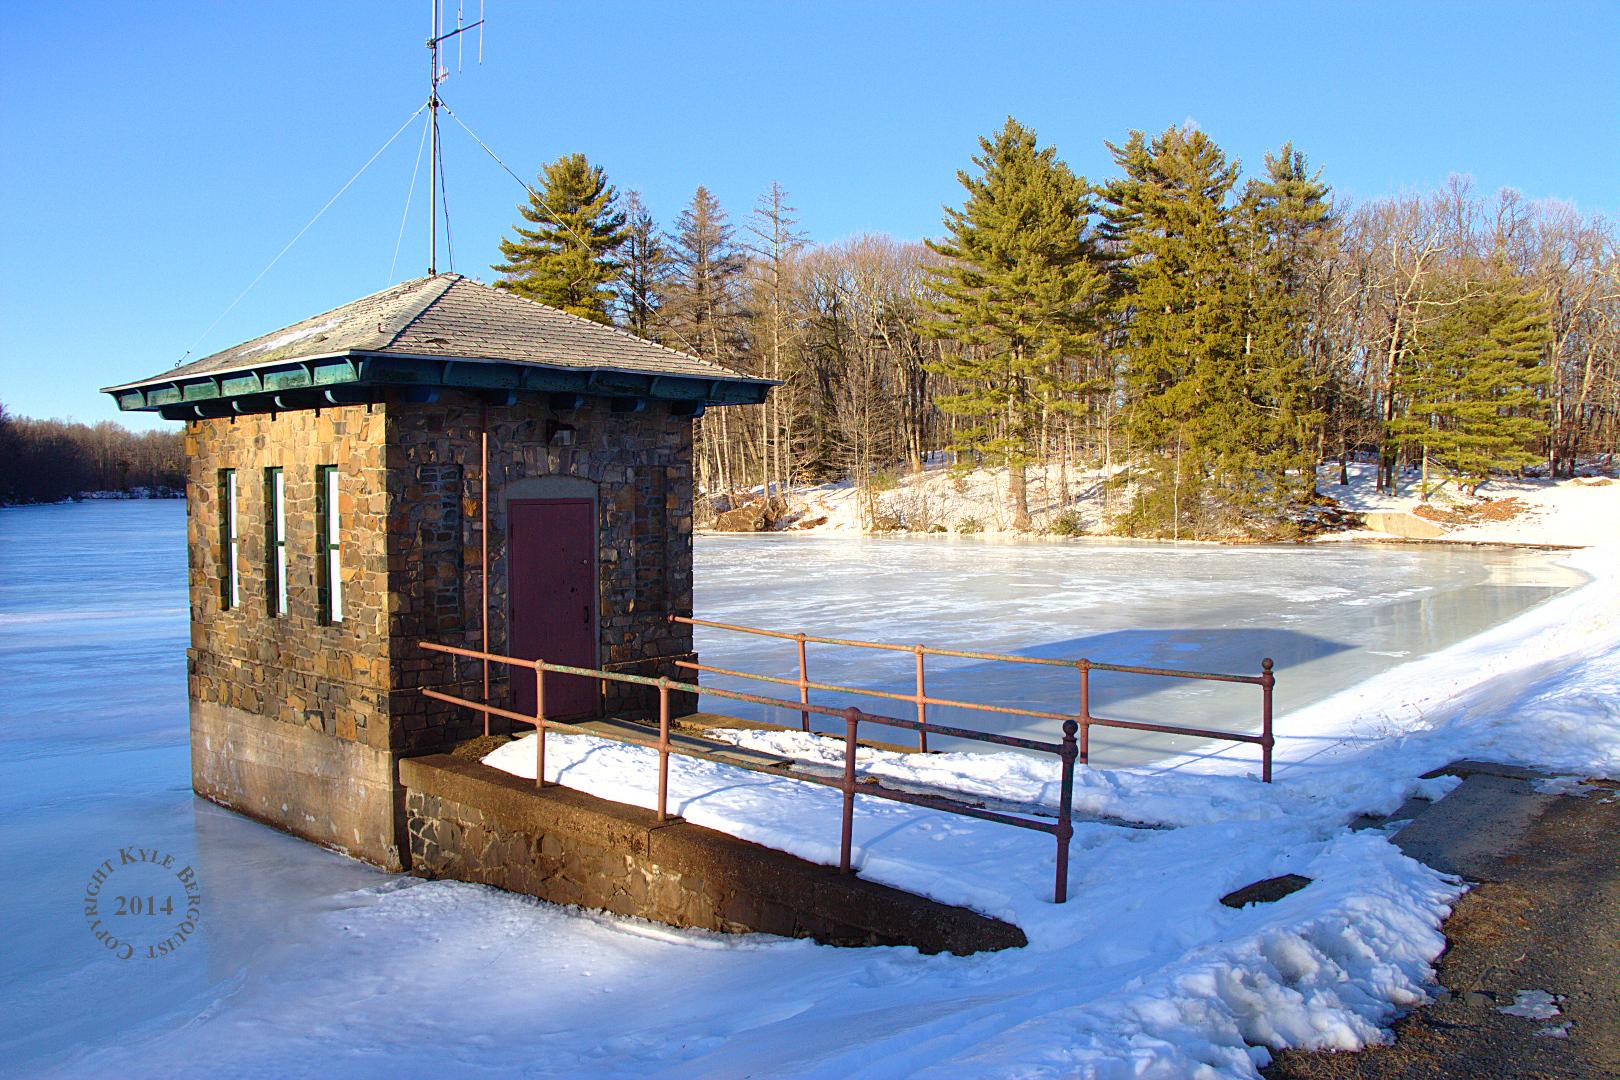 MDC Reservoir